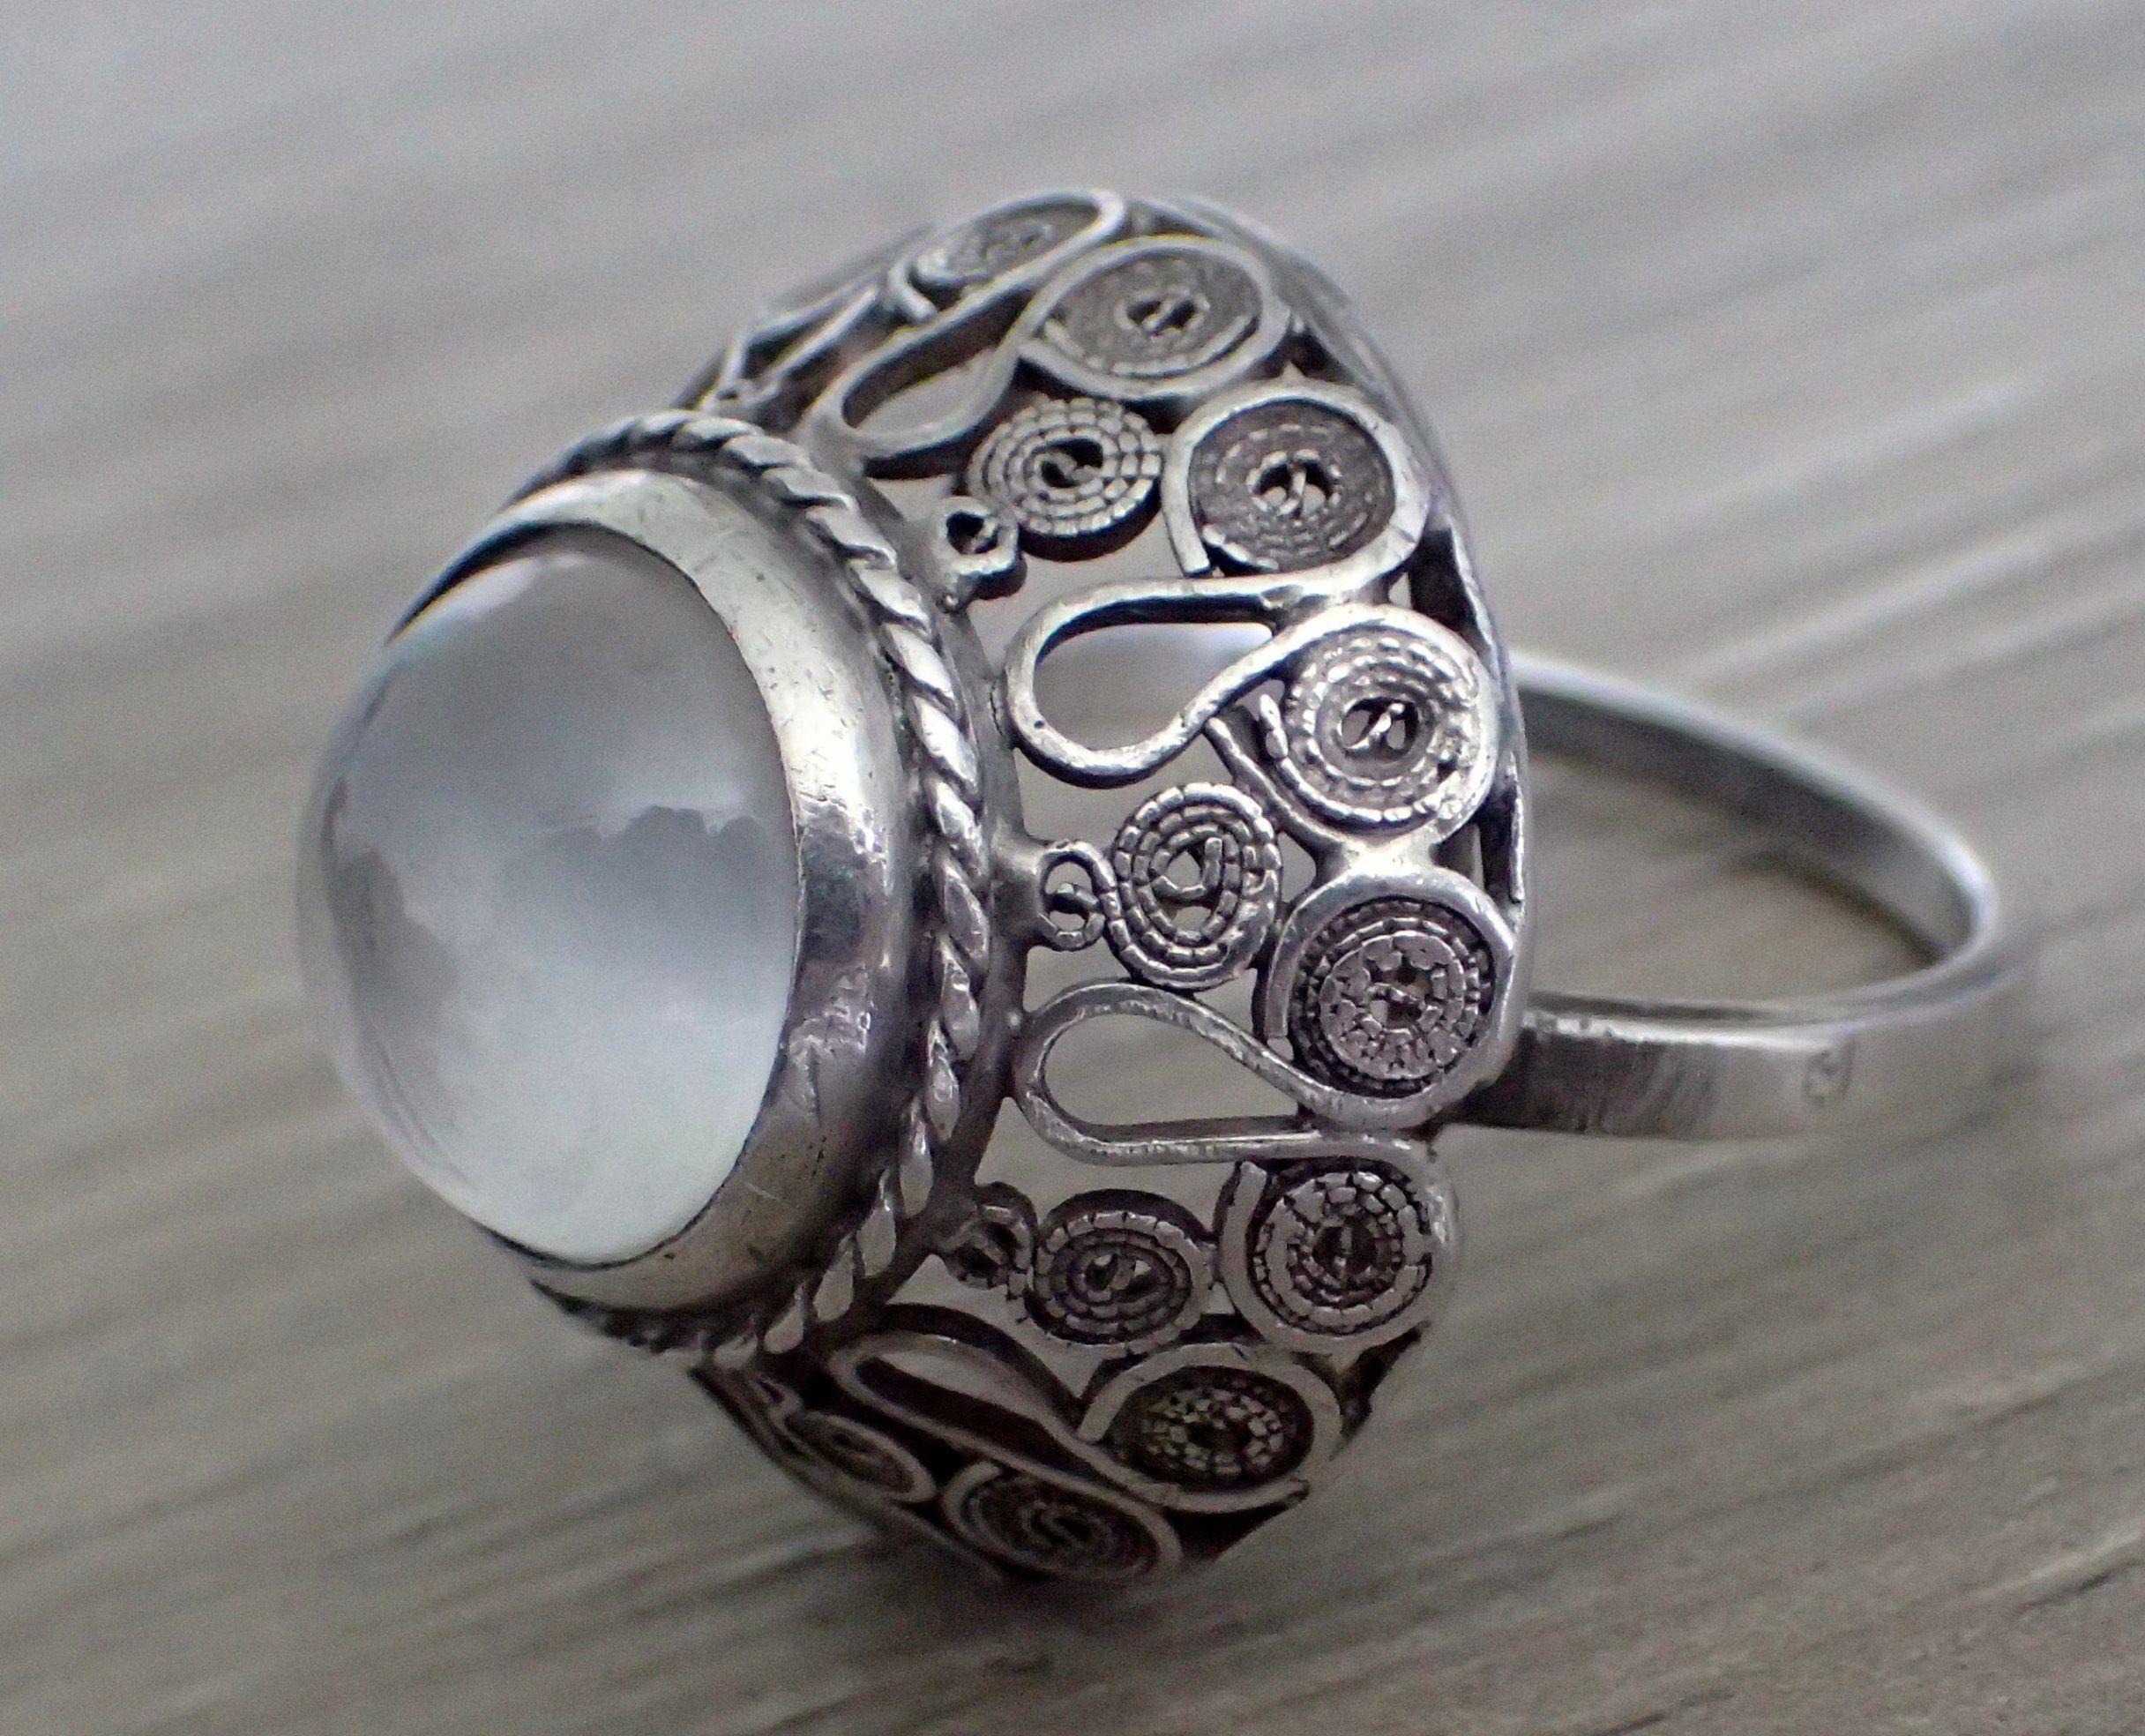 Legendarny Imago Artis Filigrany Kopula Srebro 3 6408036290 Oficjalne Archiwum Allegro Stone Jewelry Ring Old Jewelry 925 Silver Rings